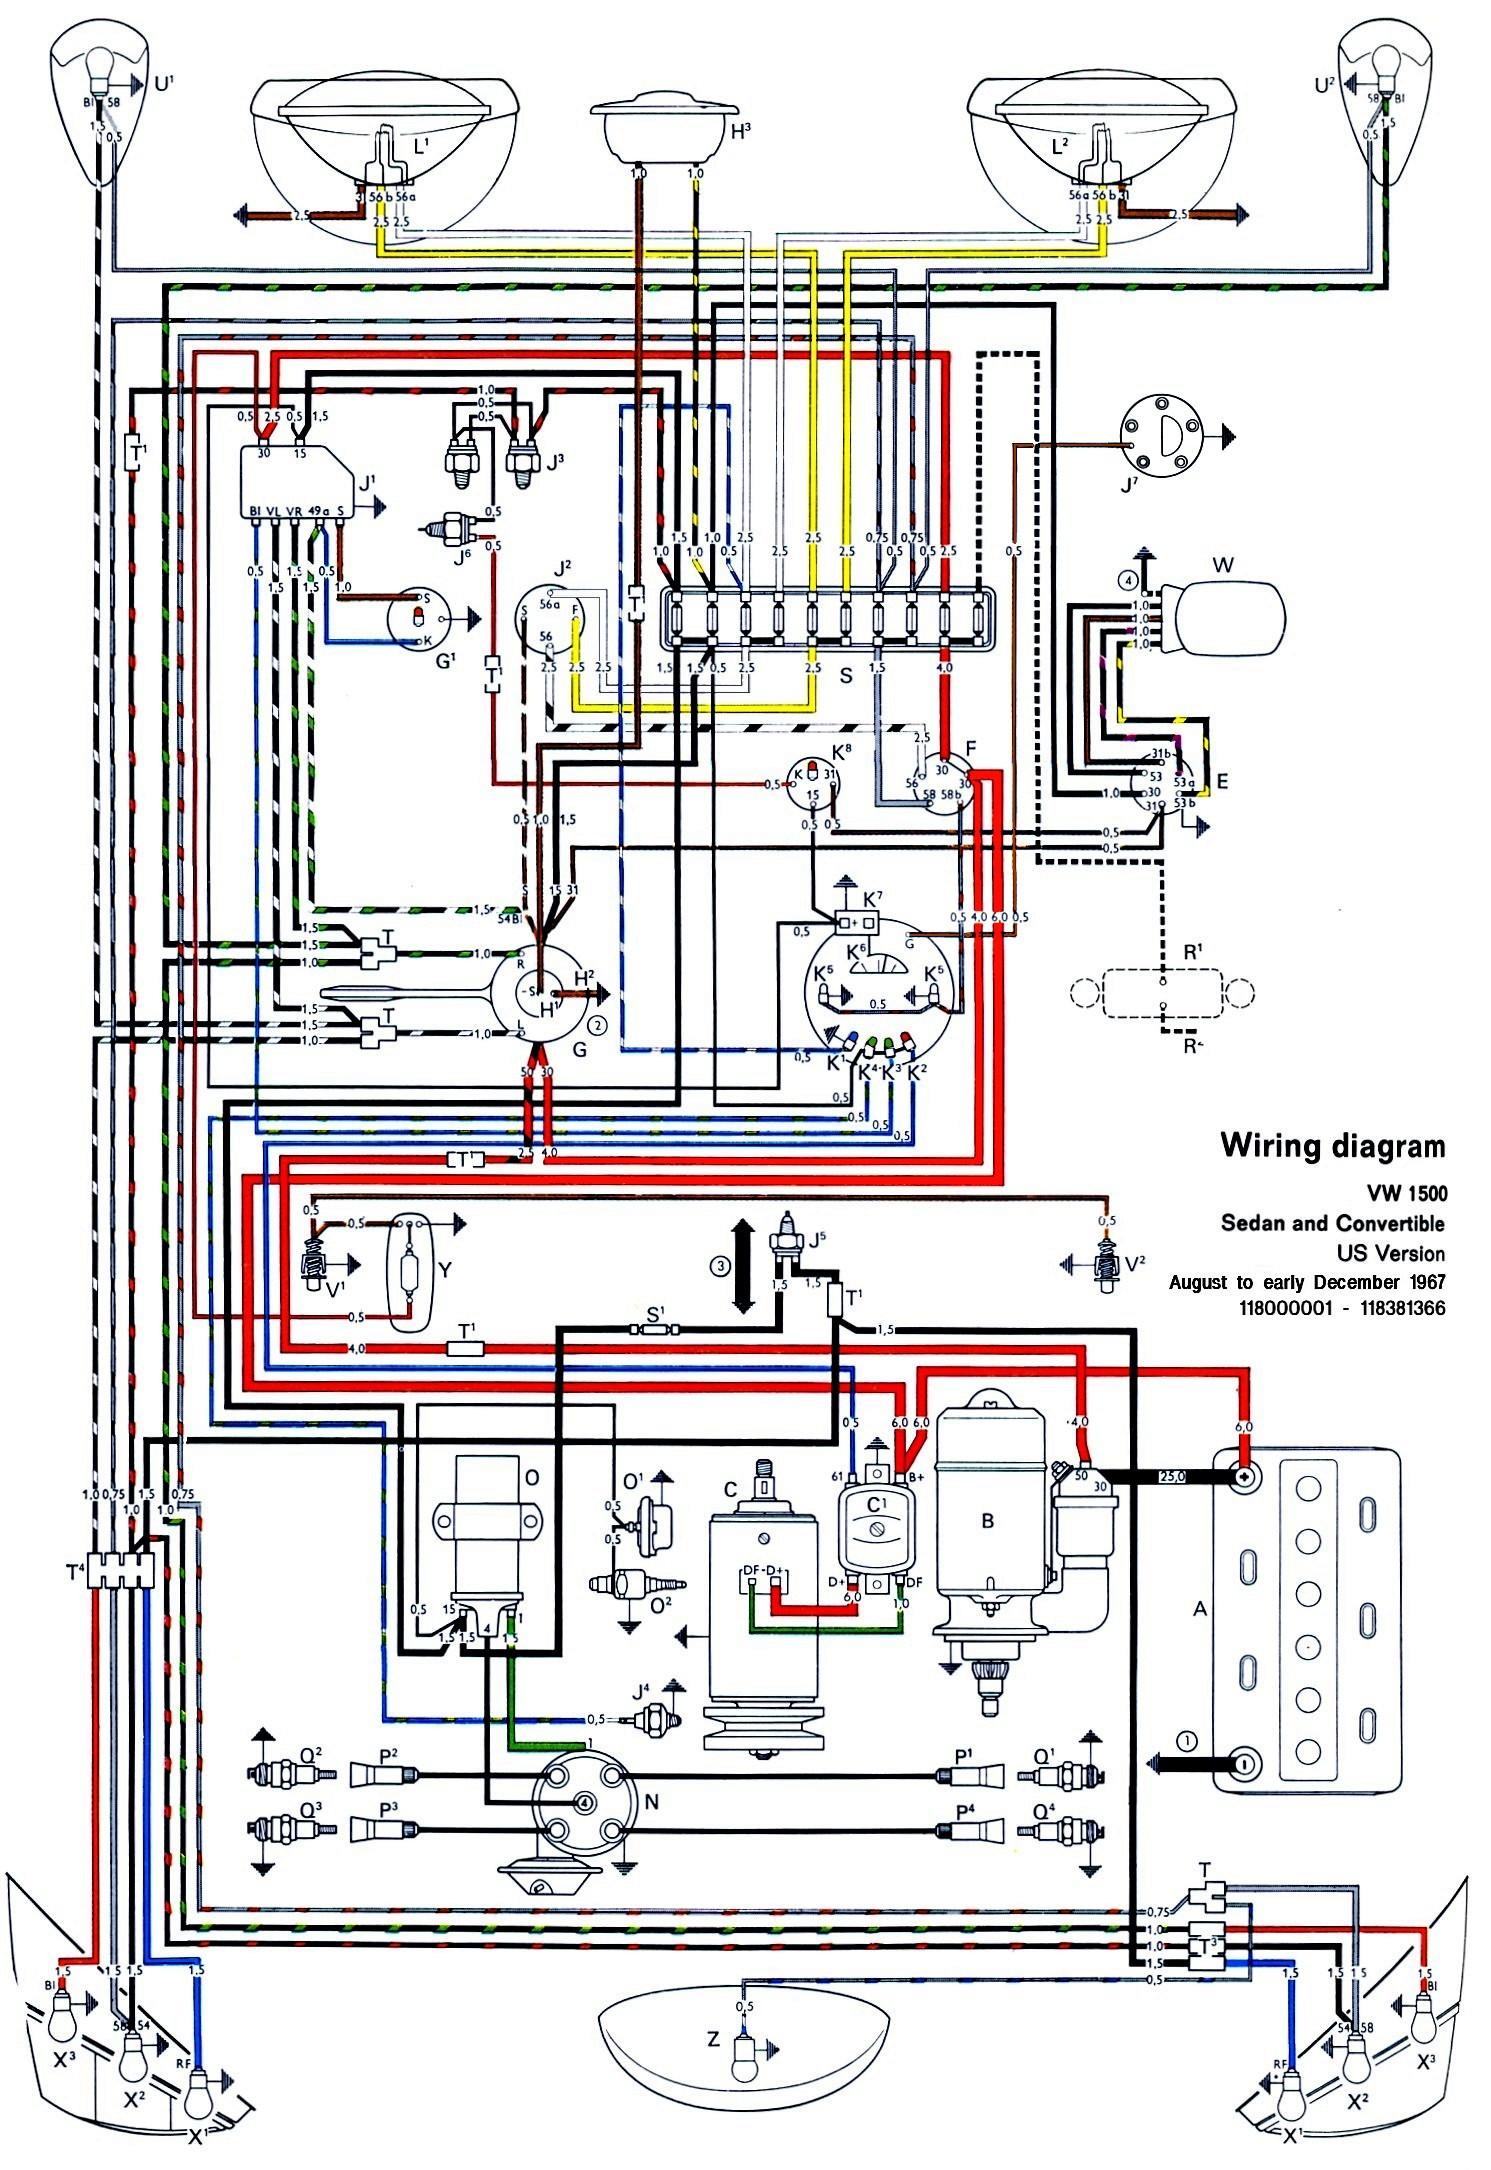 69 vw engine wiring basic electrical wiring theory 1970 vw beetle wiring diagram pin on vintage vw